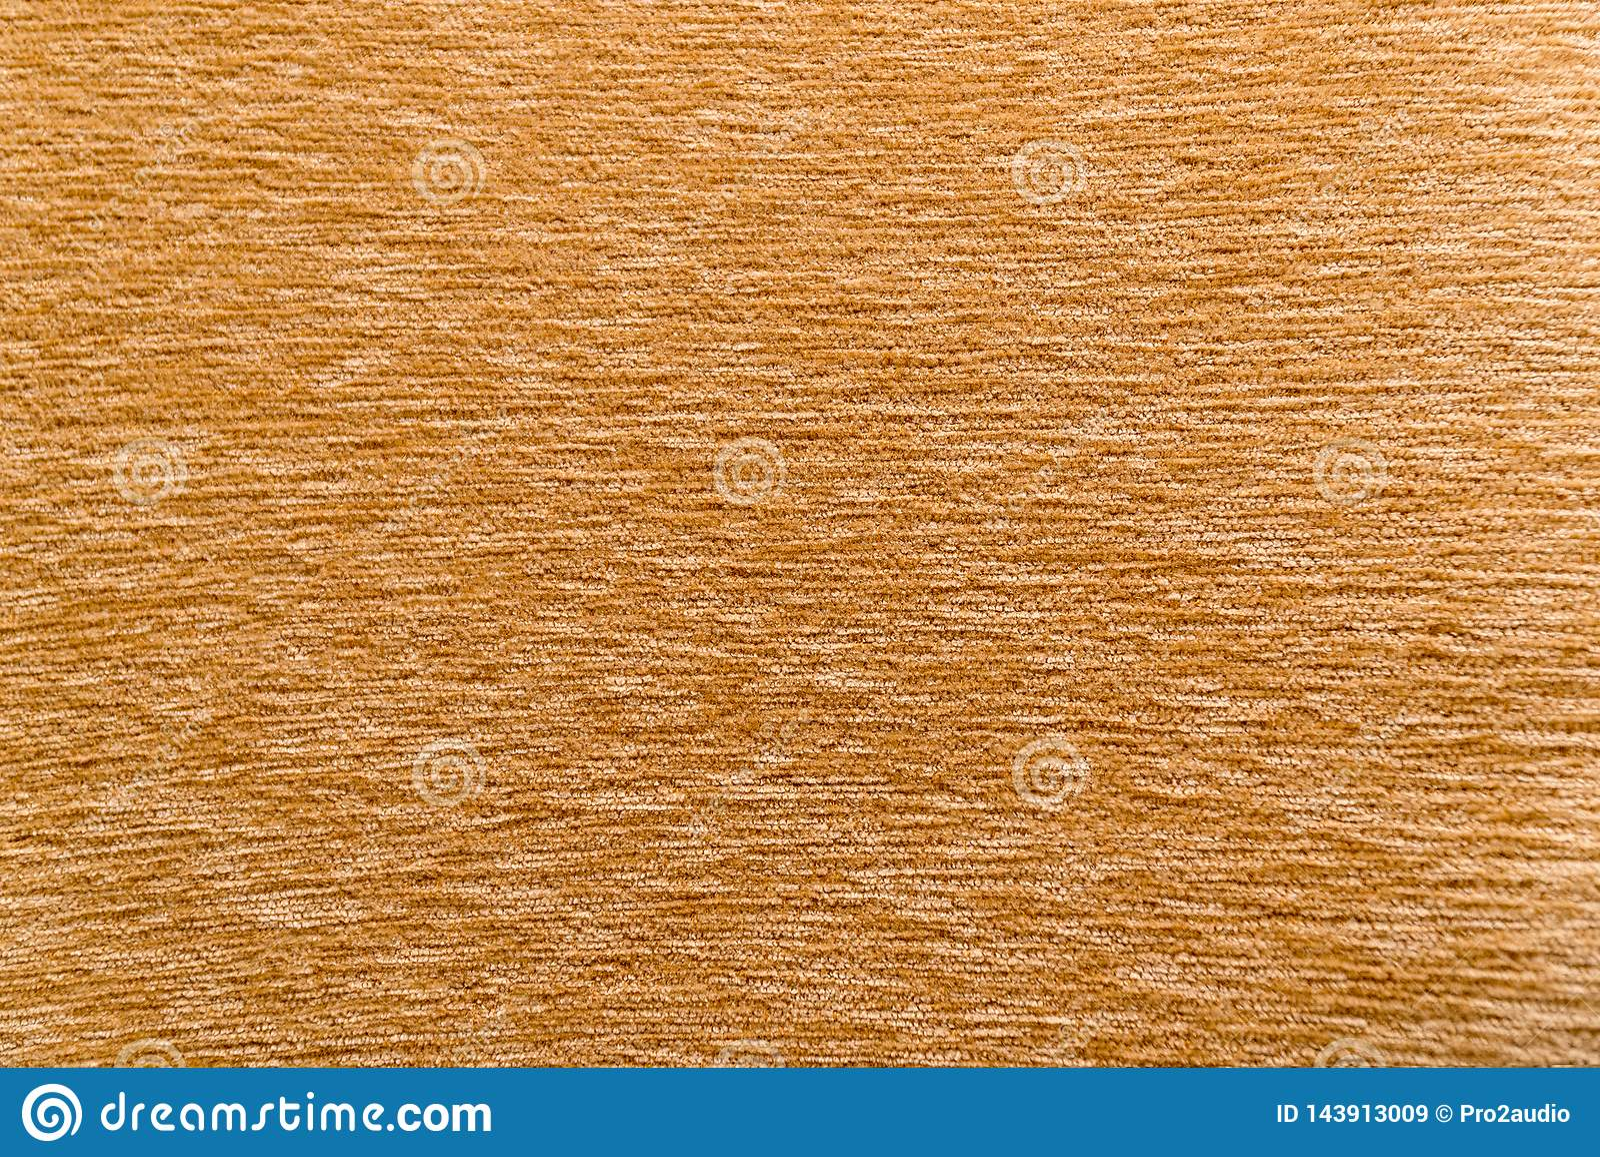 Orange wool texture for background